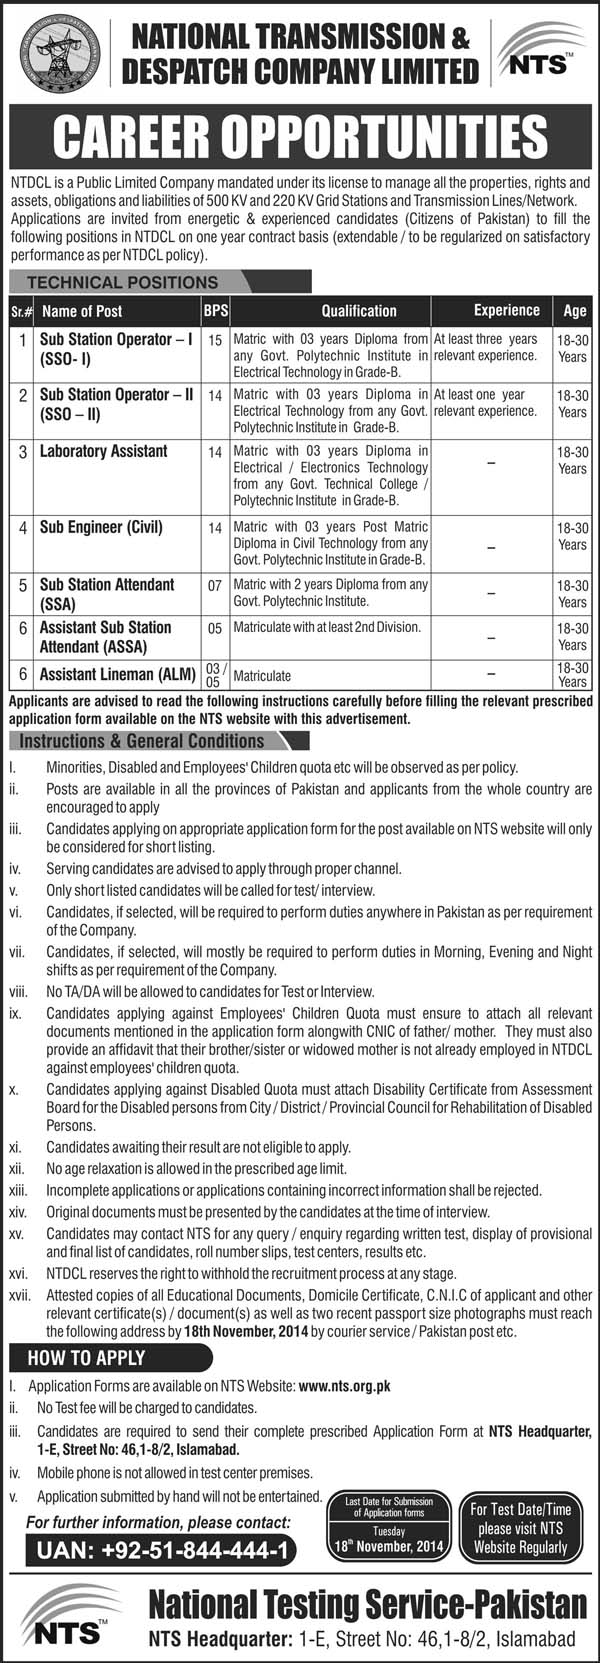 ntdc jobs opportunities